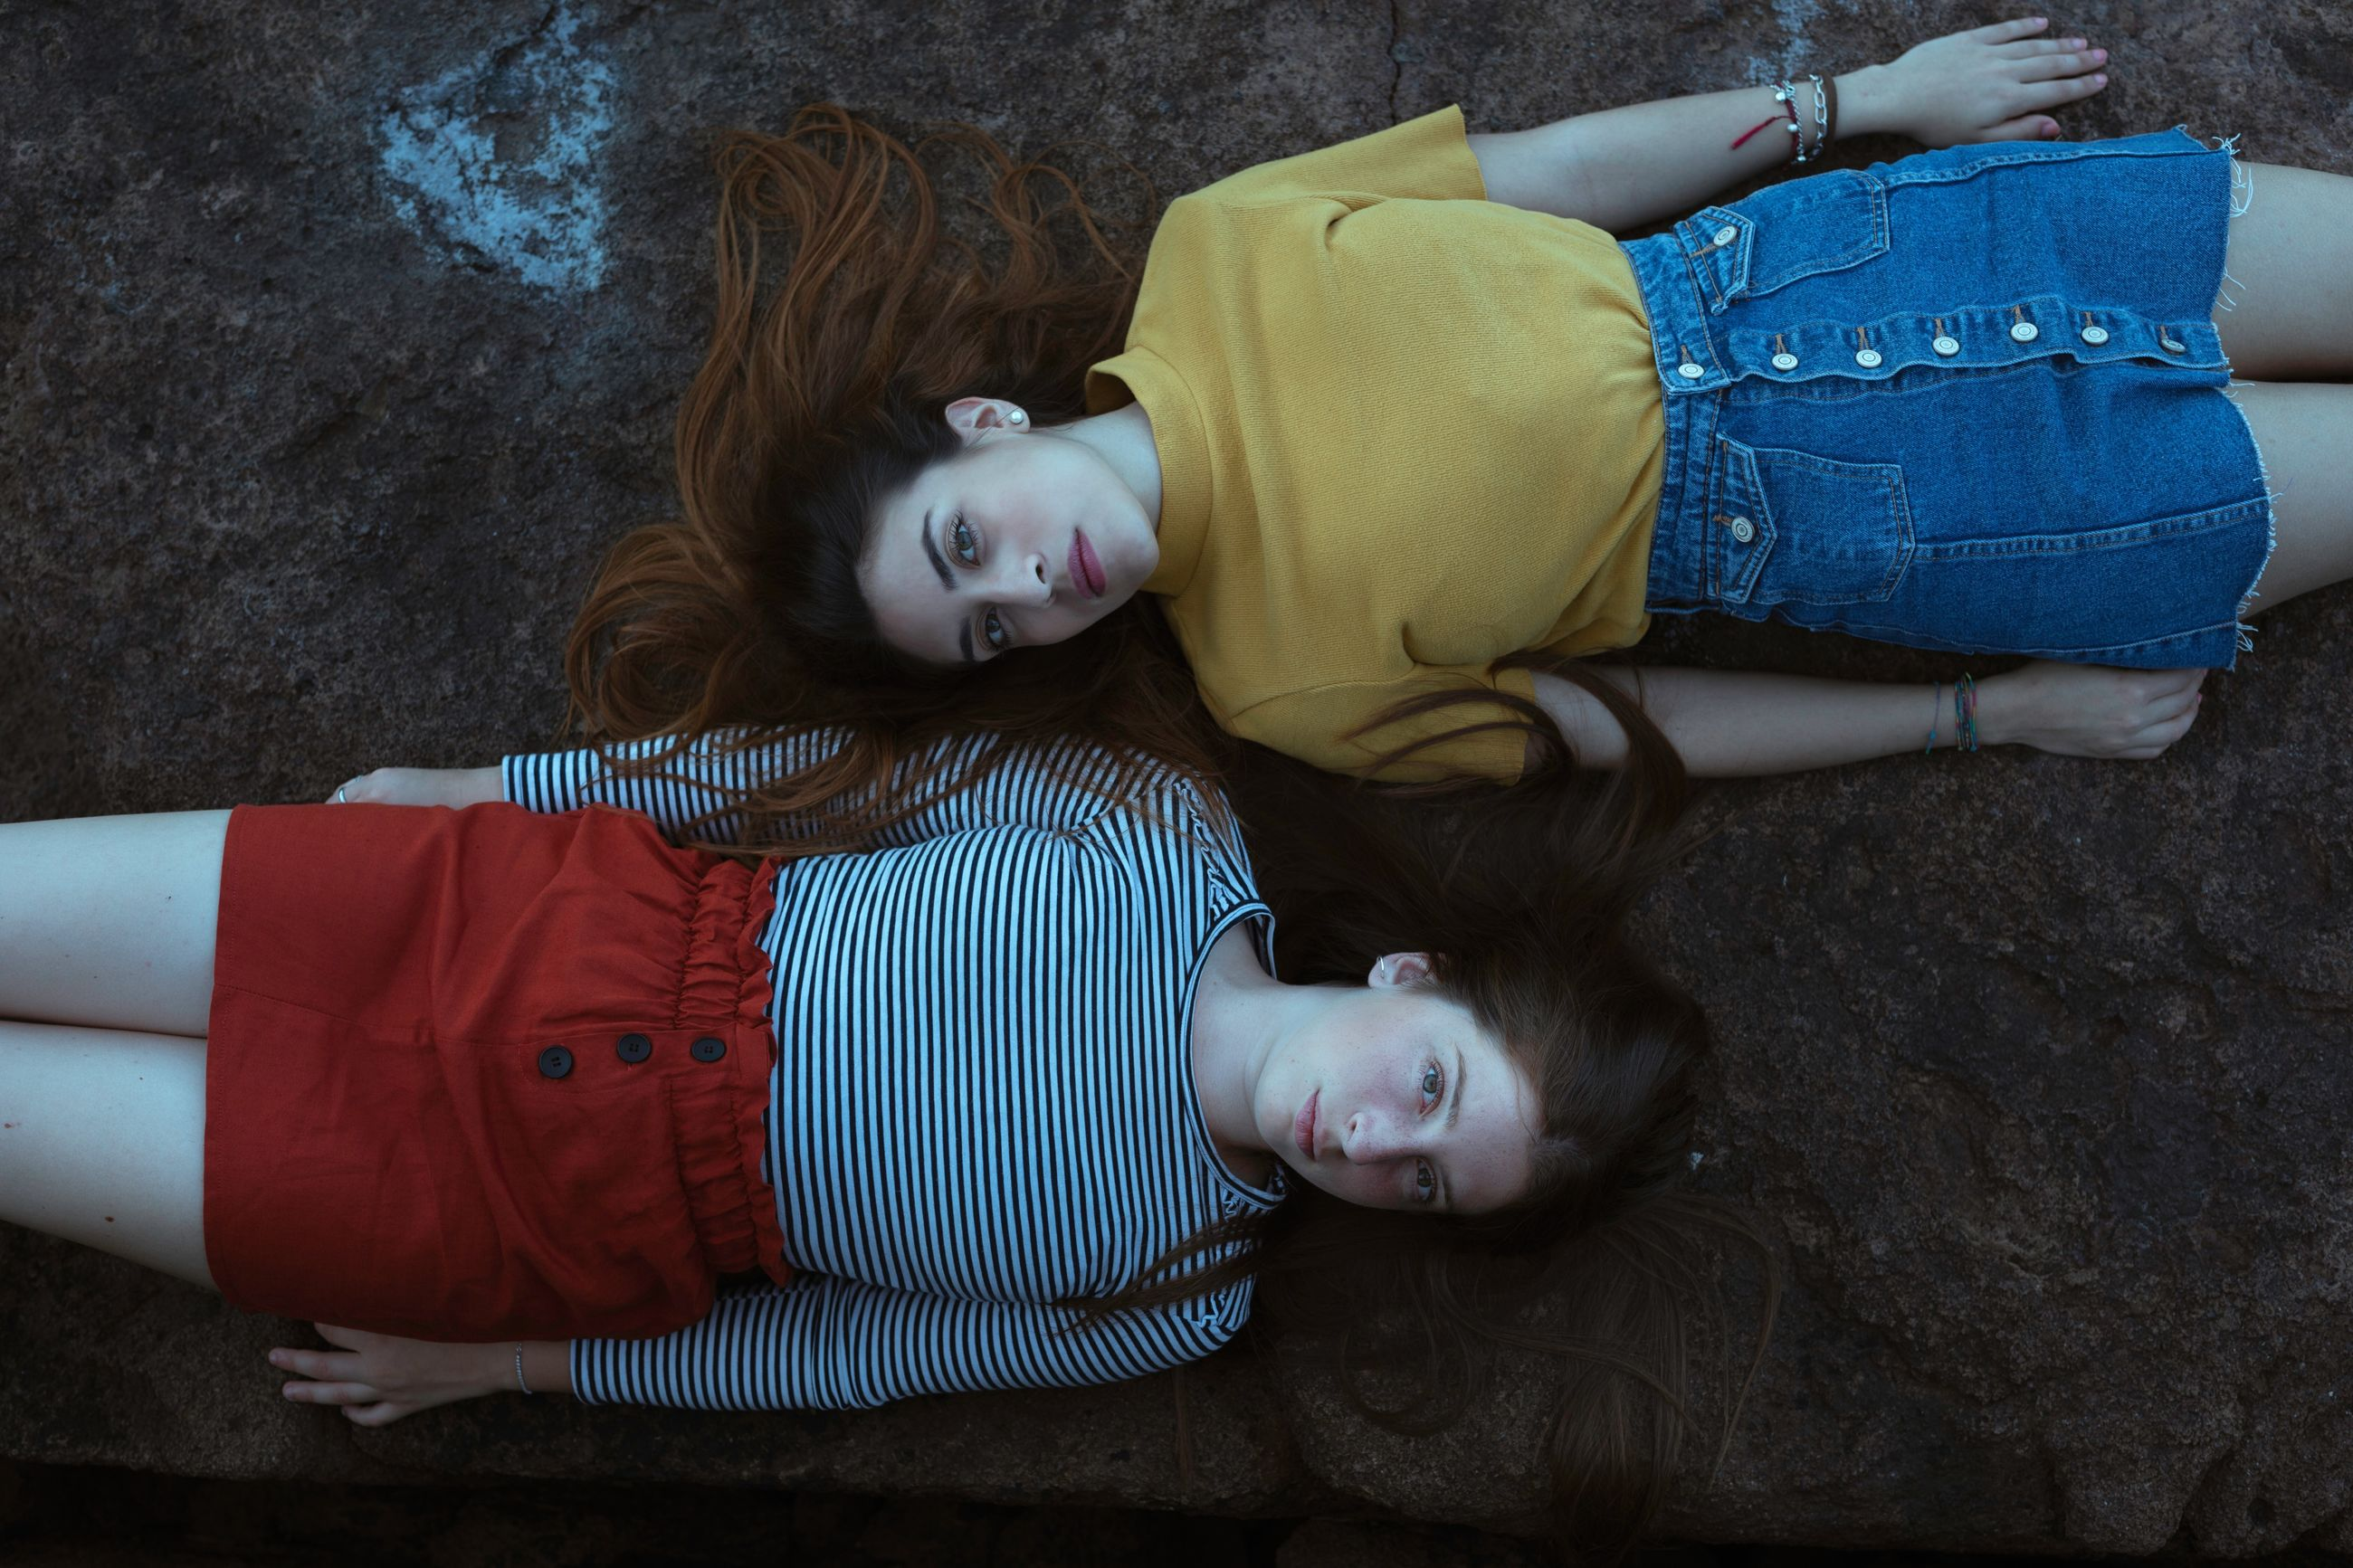 HIGH ANGLE PORTRAIT OF CUTE GIRL LYING DOWN ON SOFA